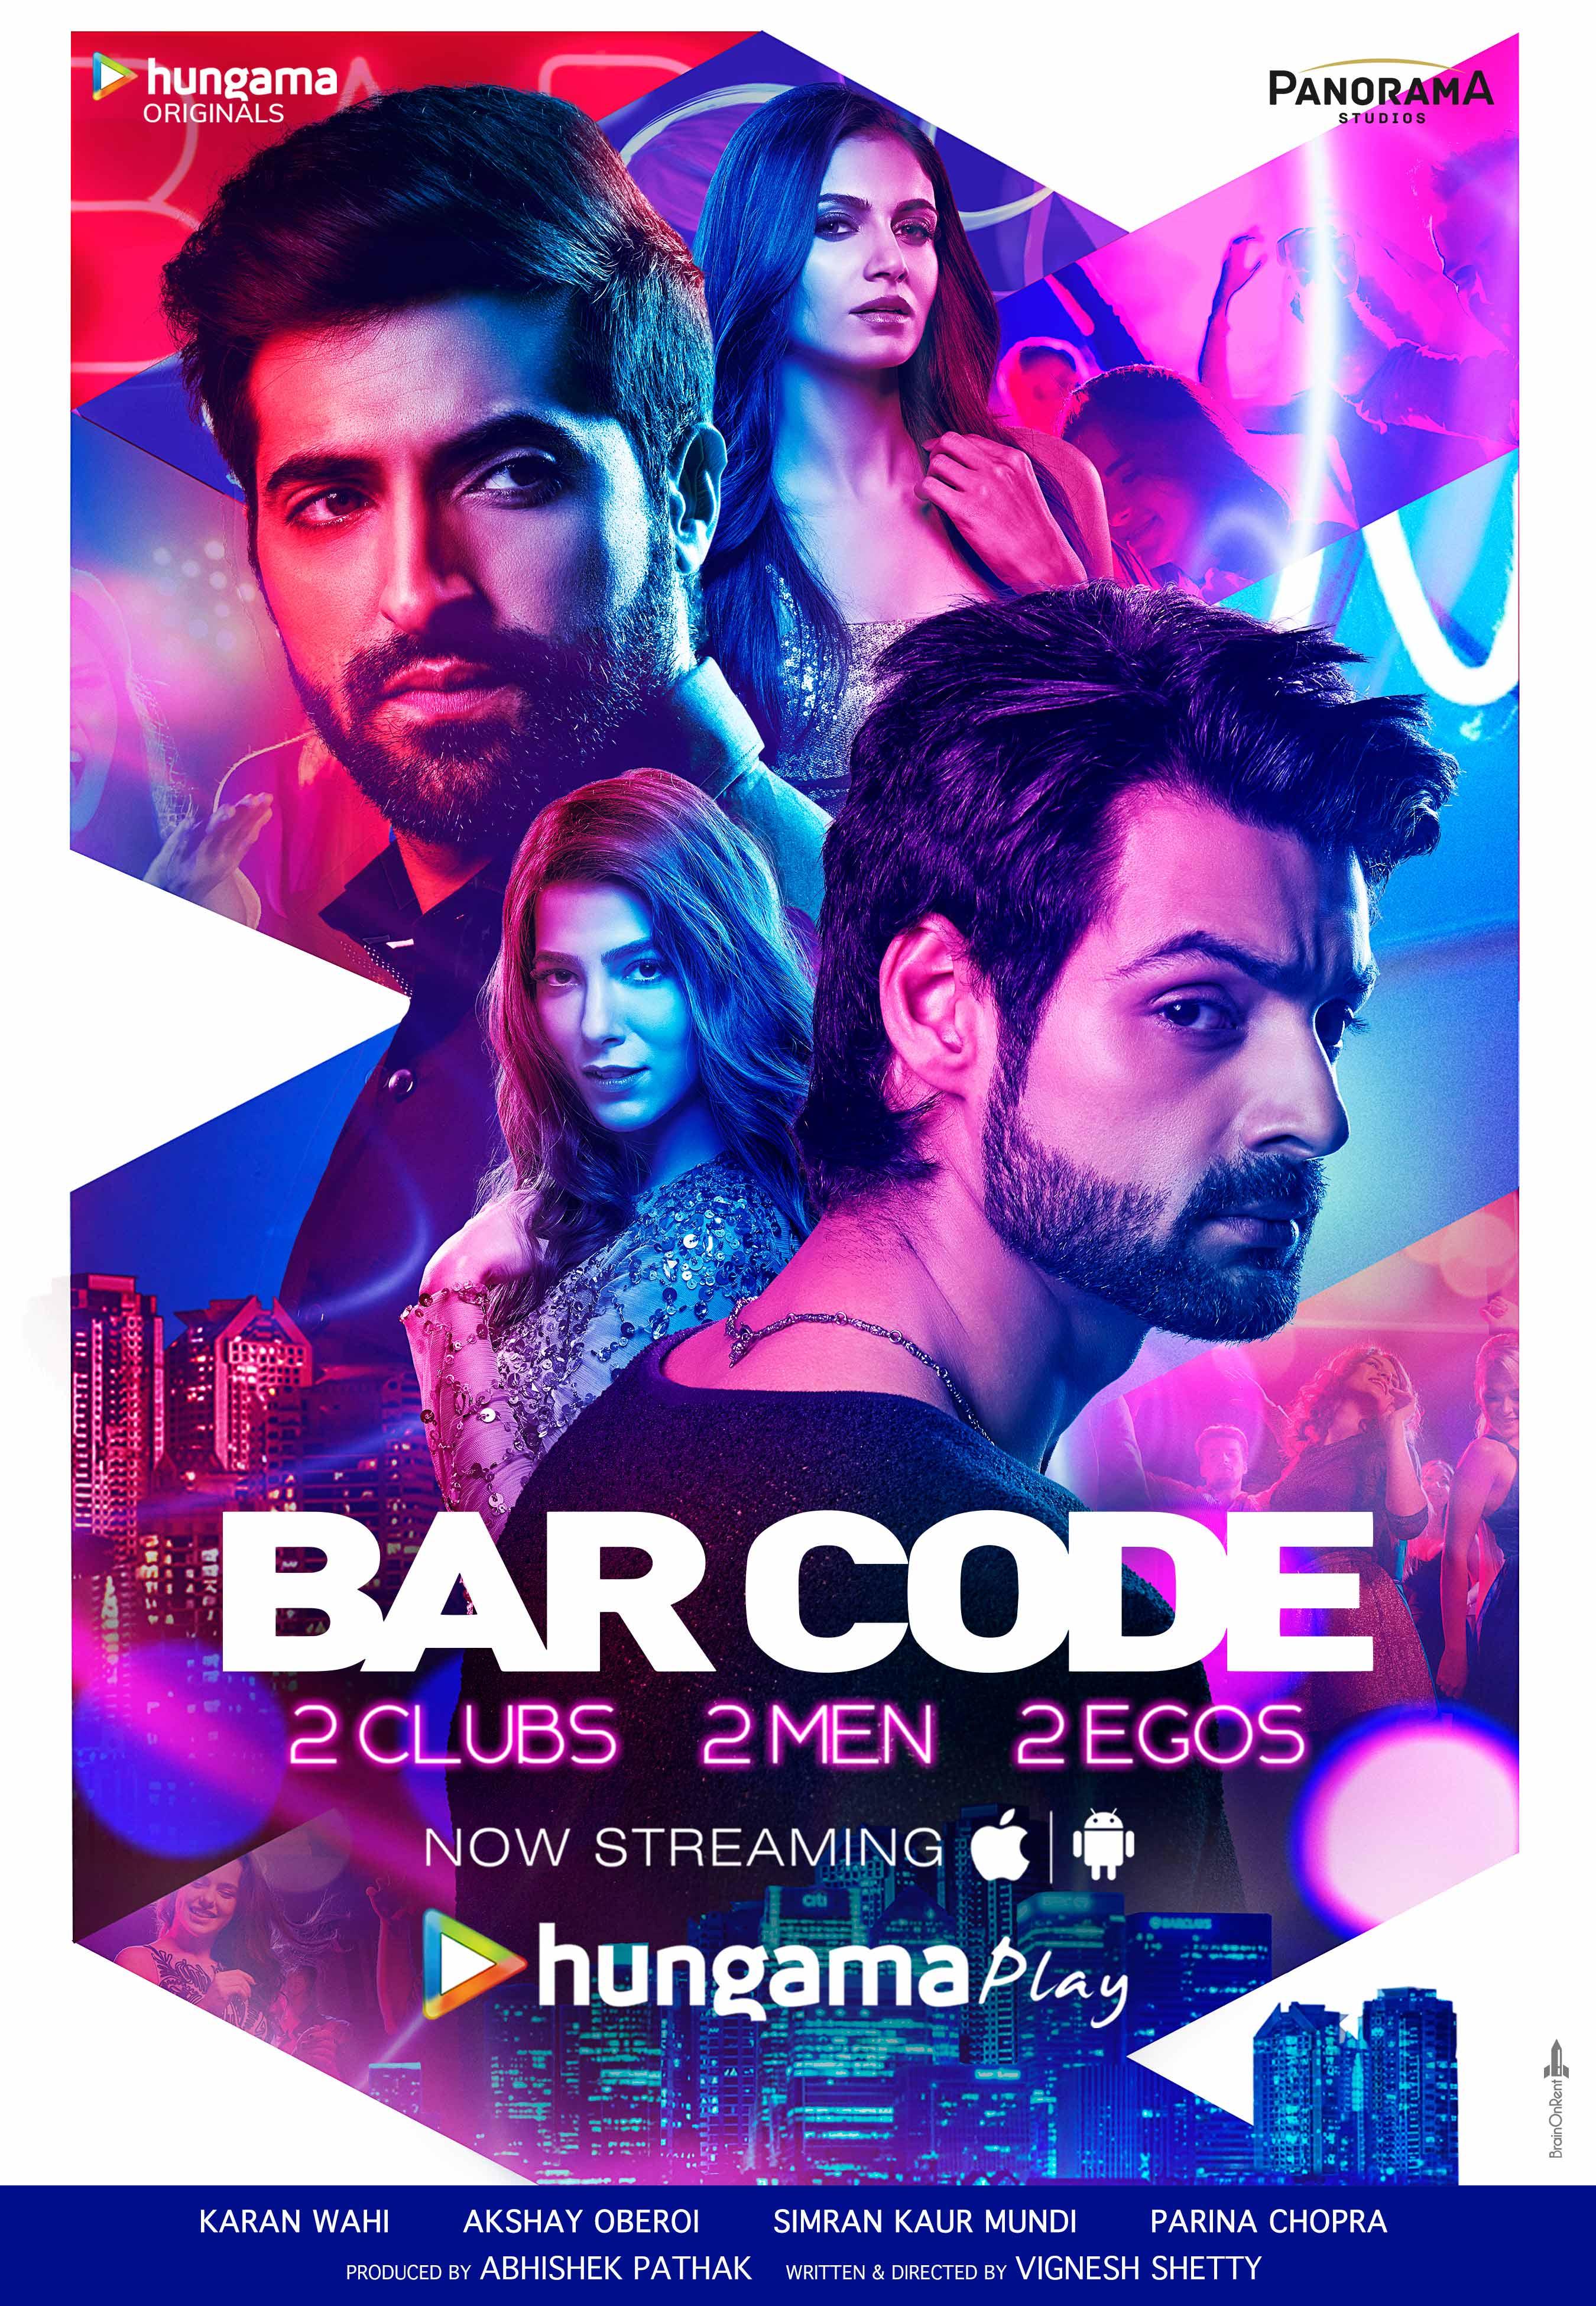 Bar Code 2018 S01 Hindi Hungama Originals Series 720p WEB-DL